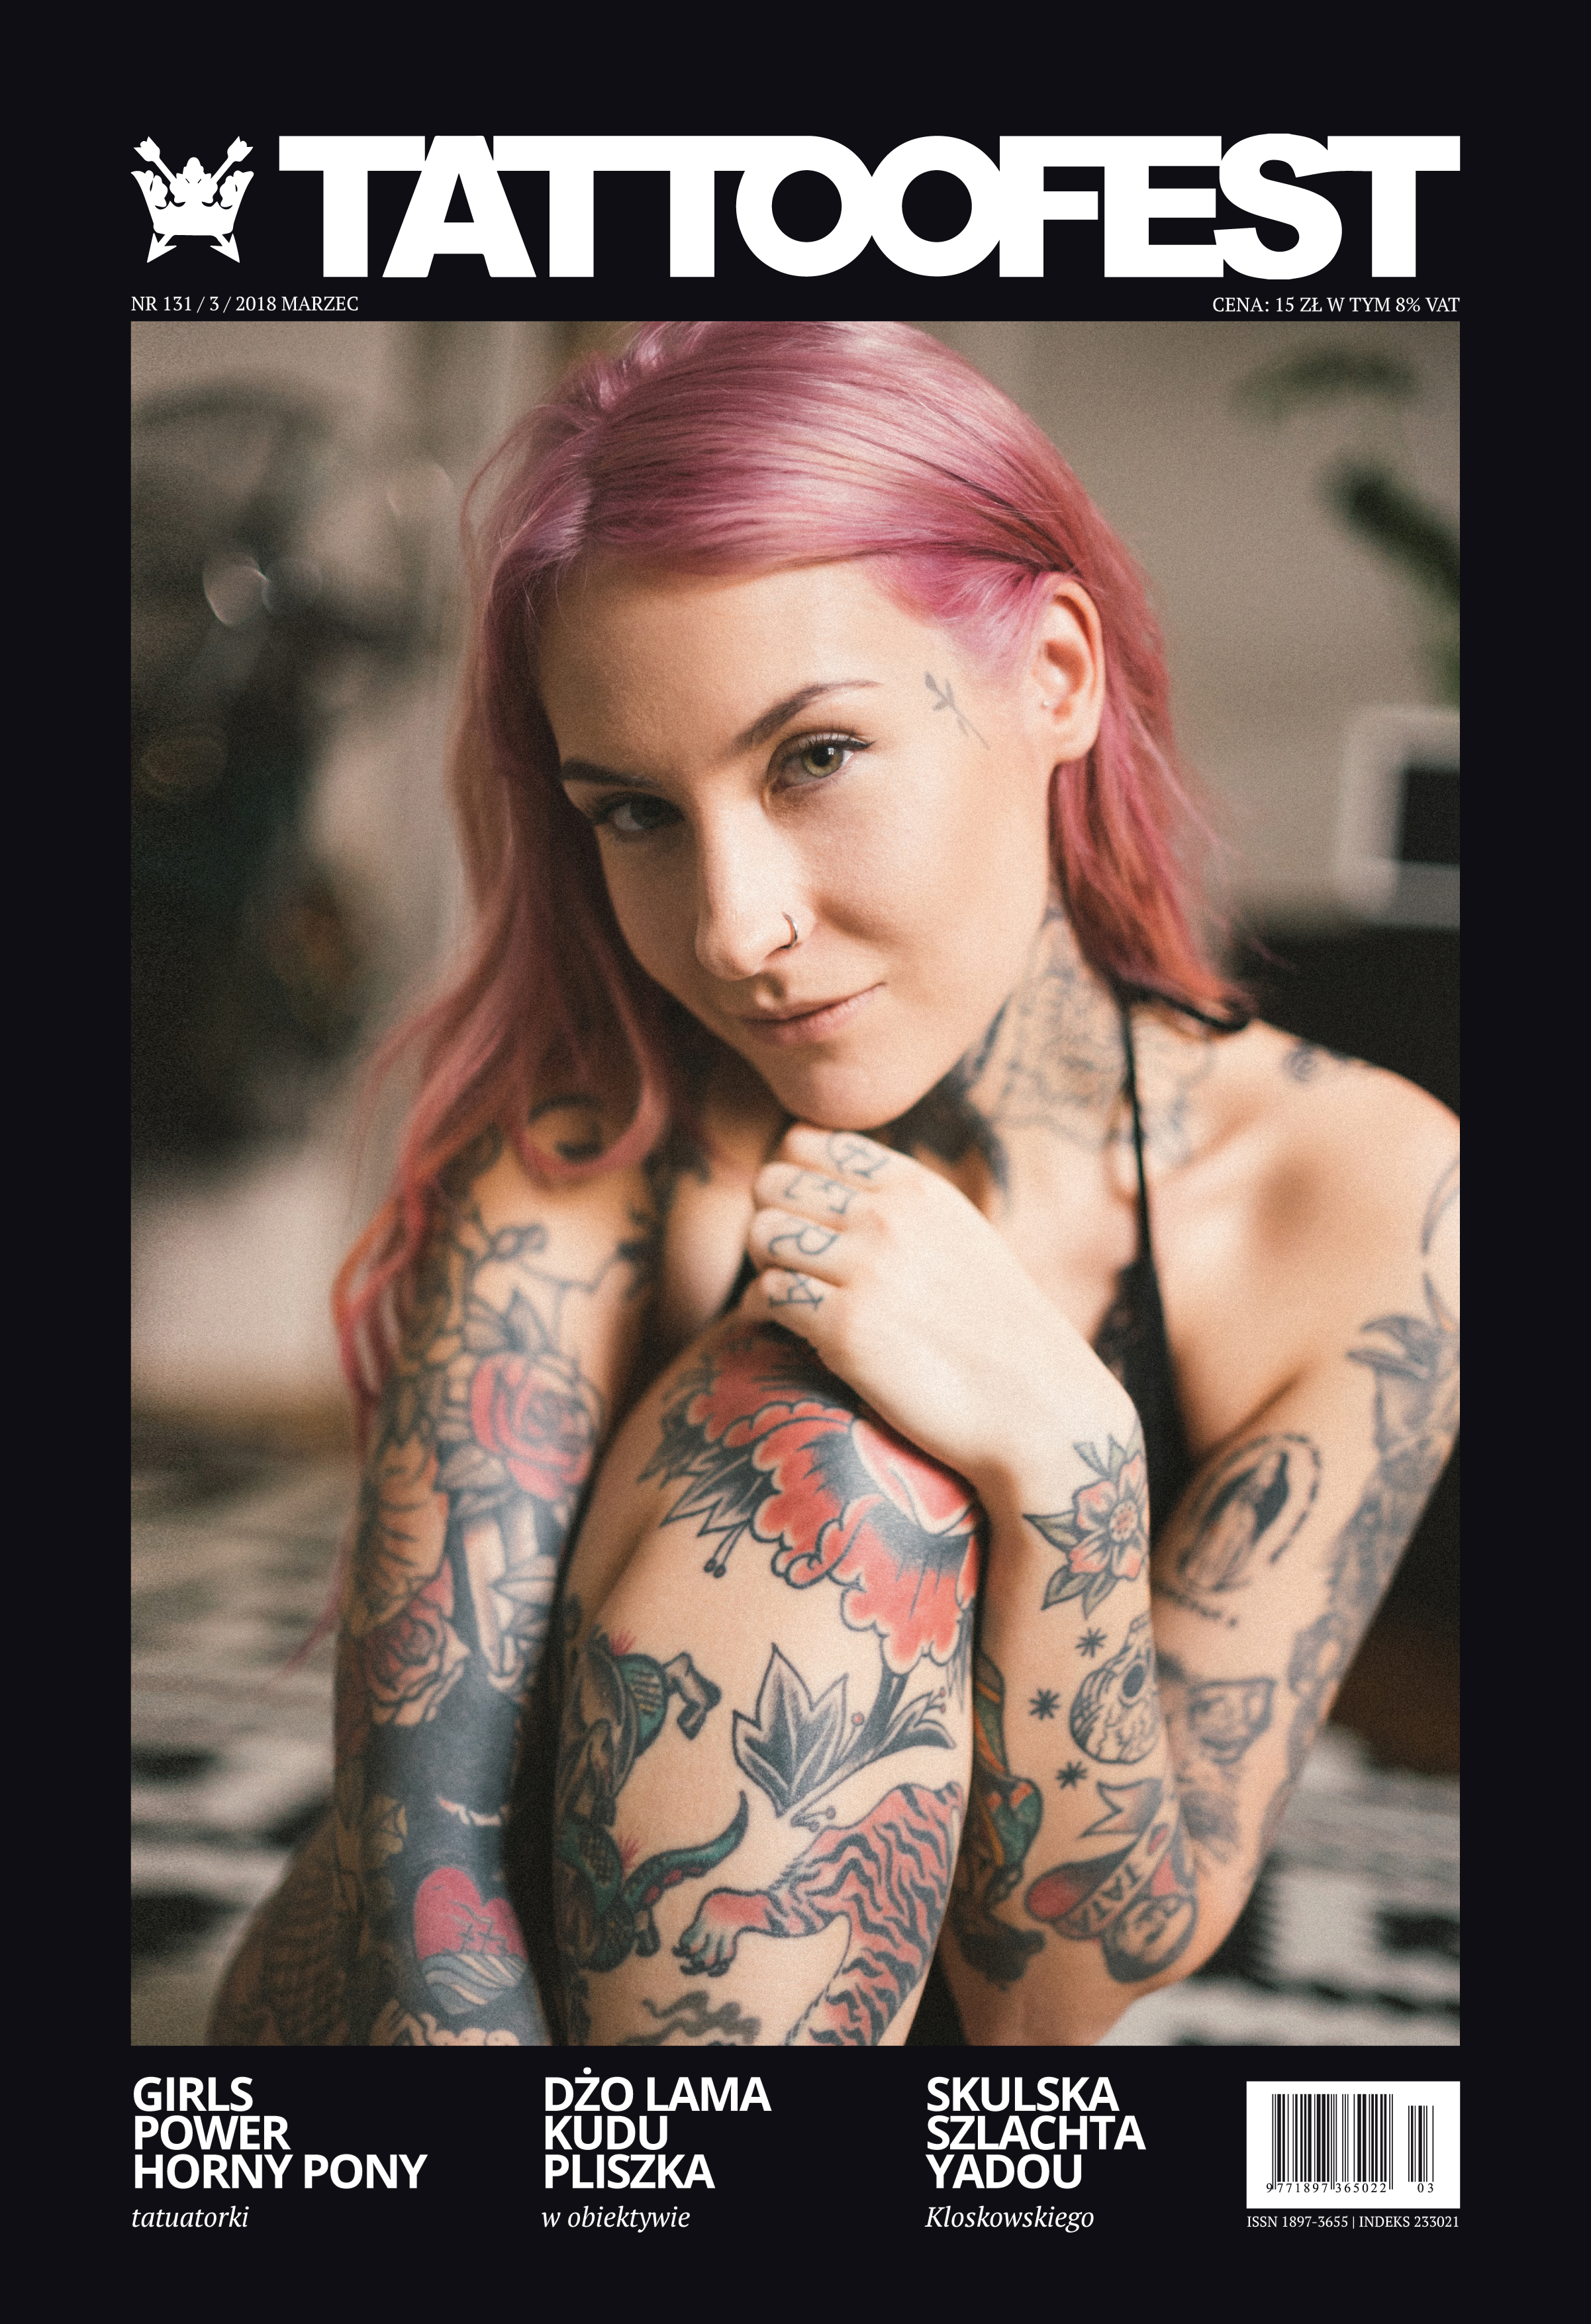 TattooFest Magazine - Marzec 2018